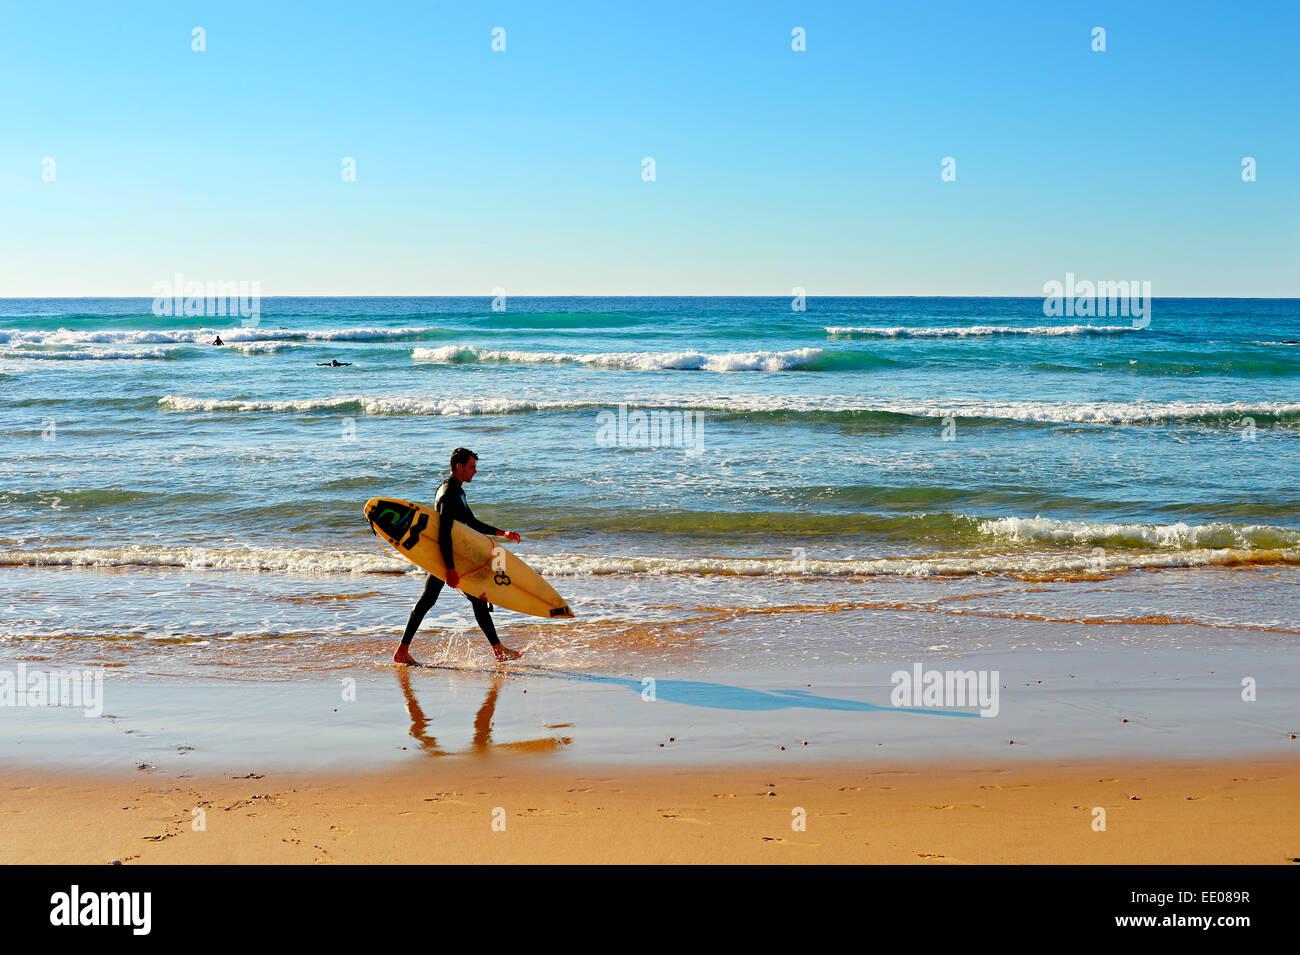 Nicht identifizierte Surfer am Strand. Stockbild